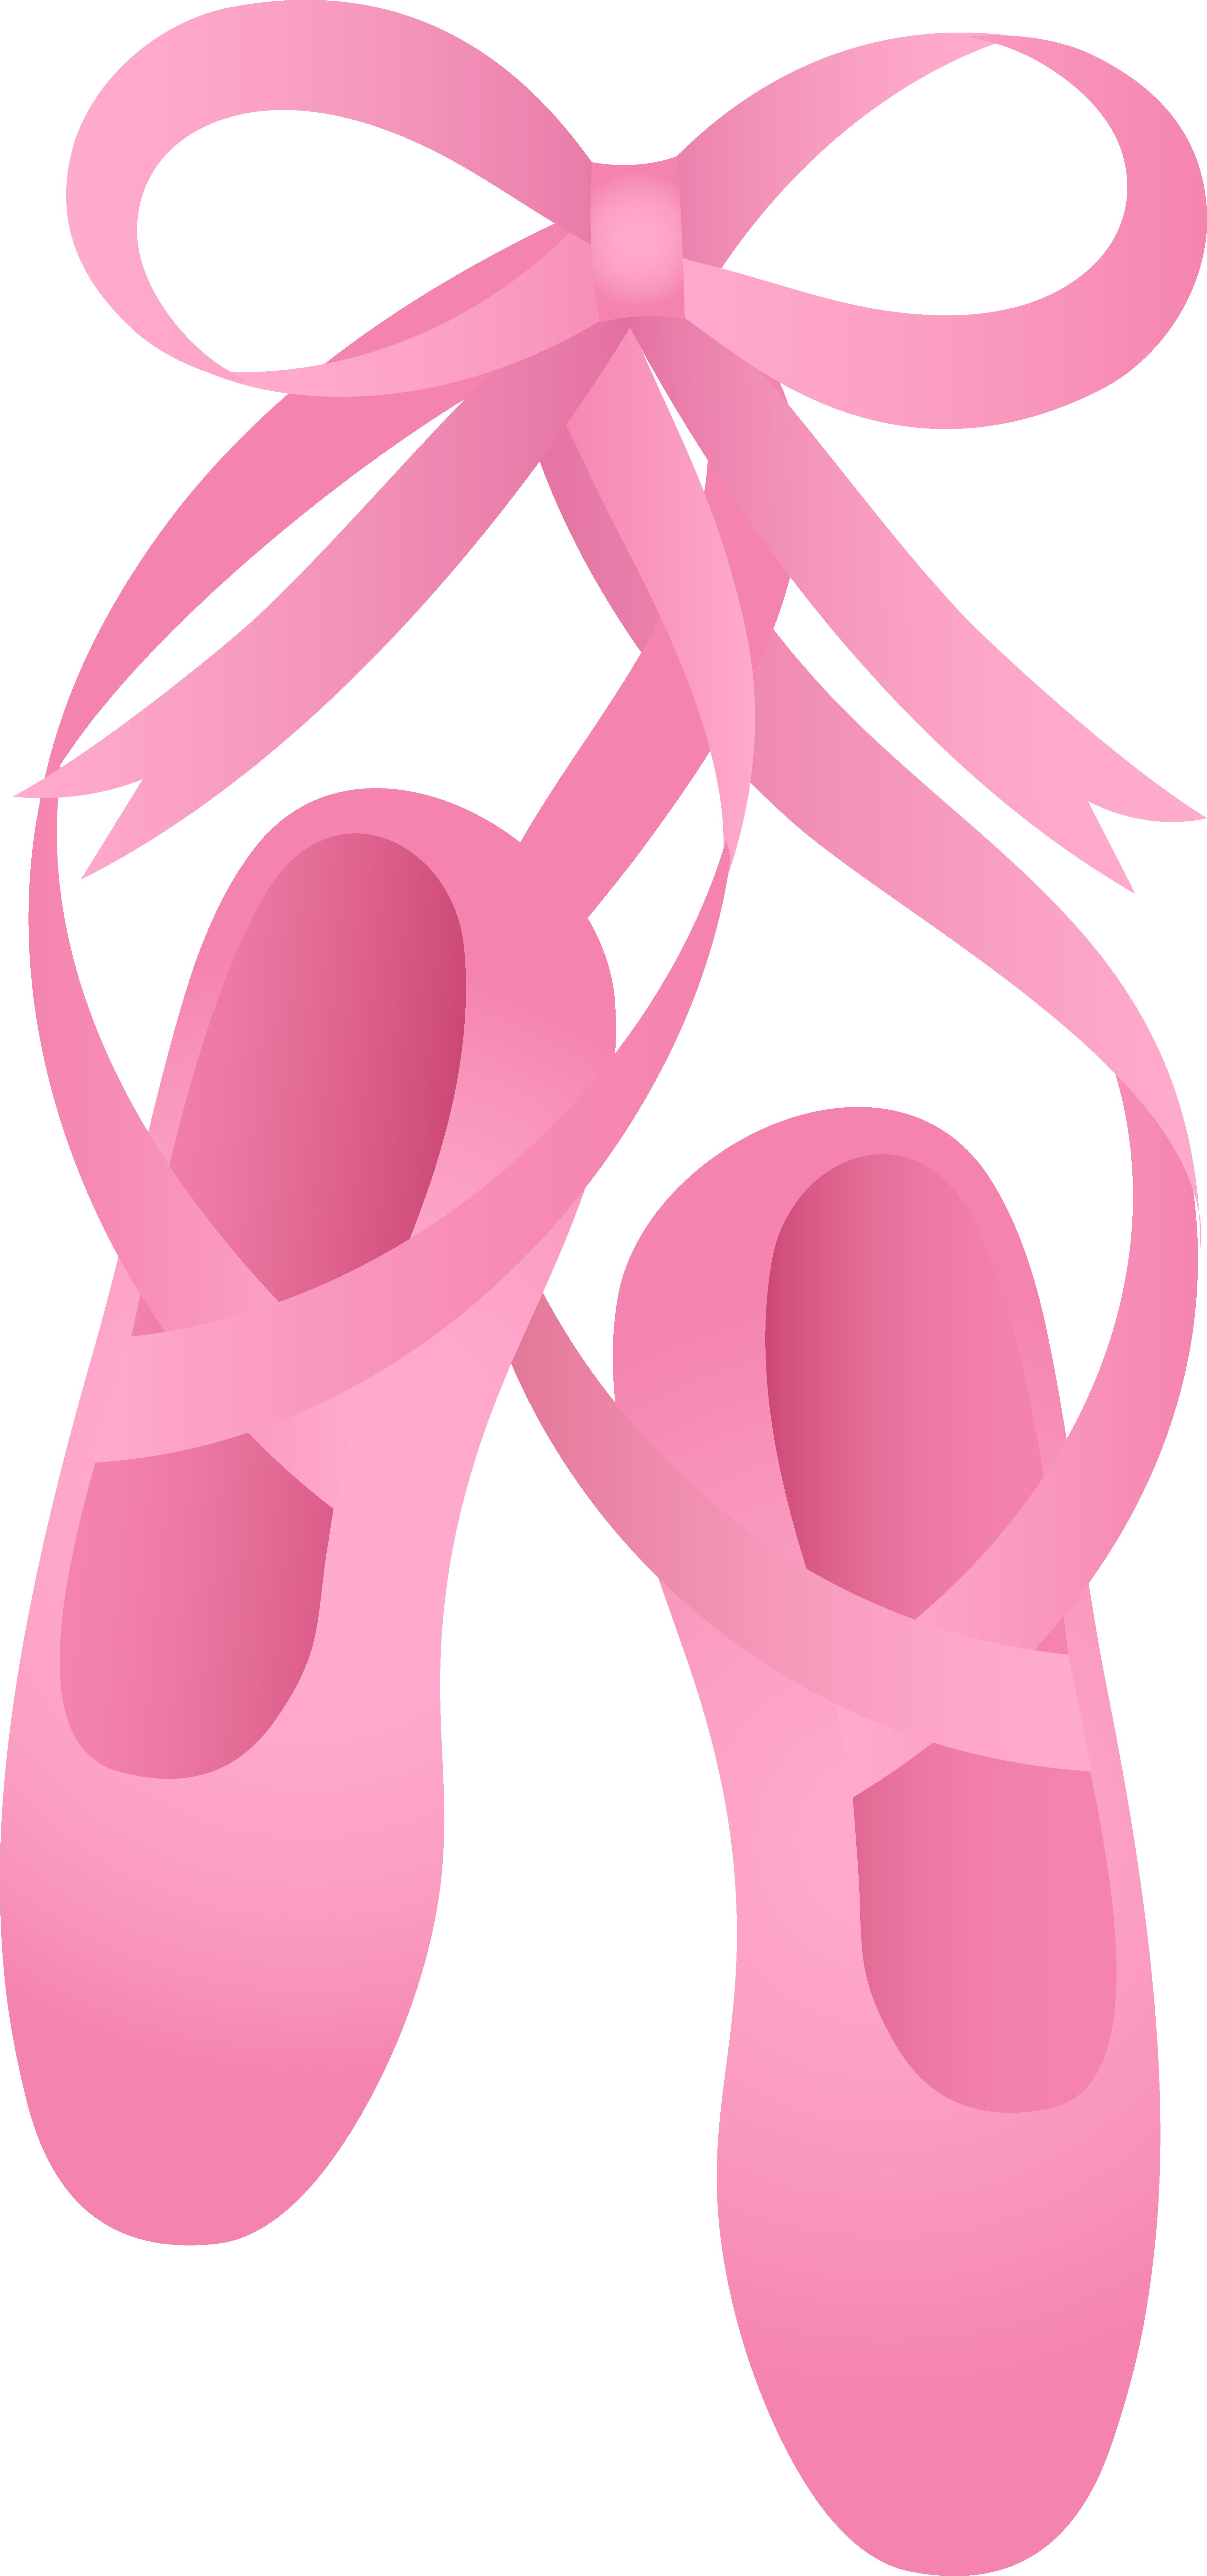 Ribbon clipart ballet #4